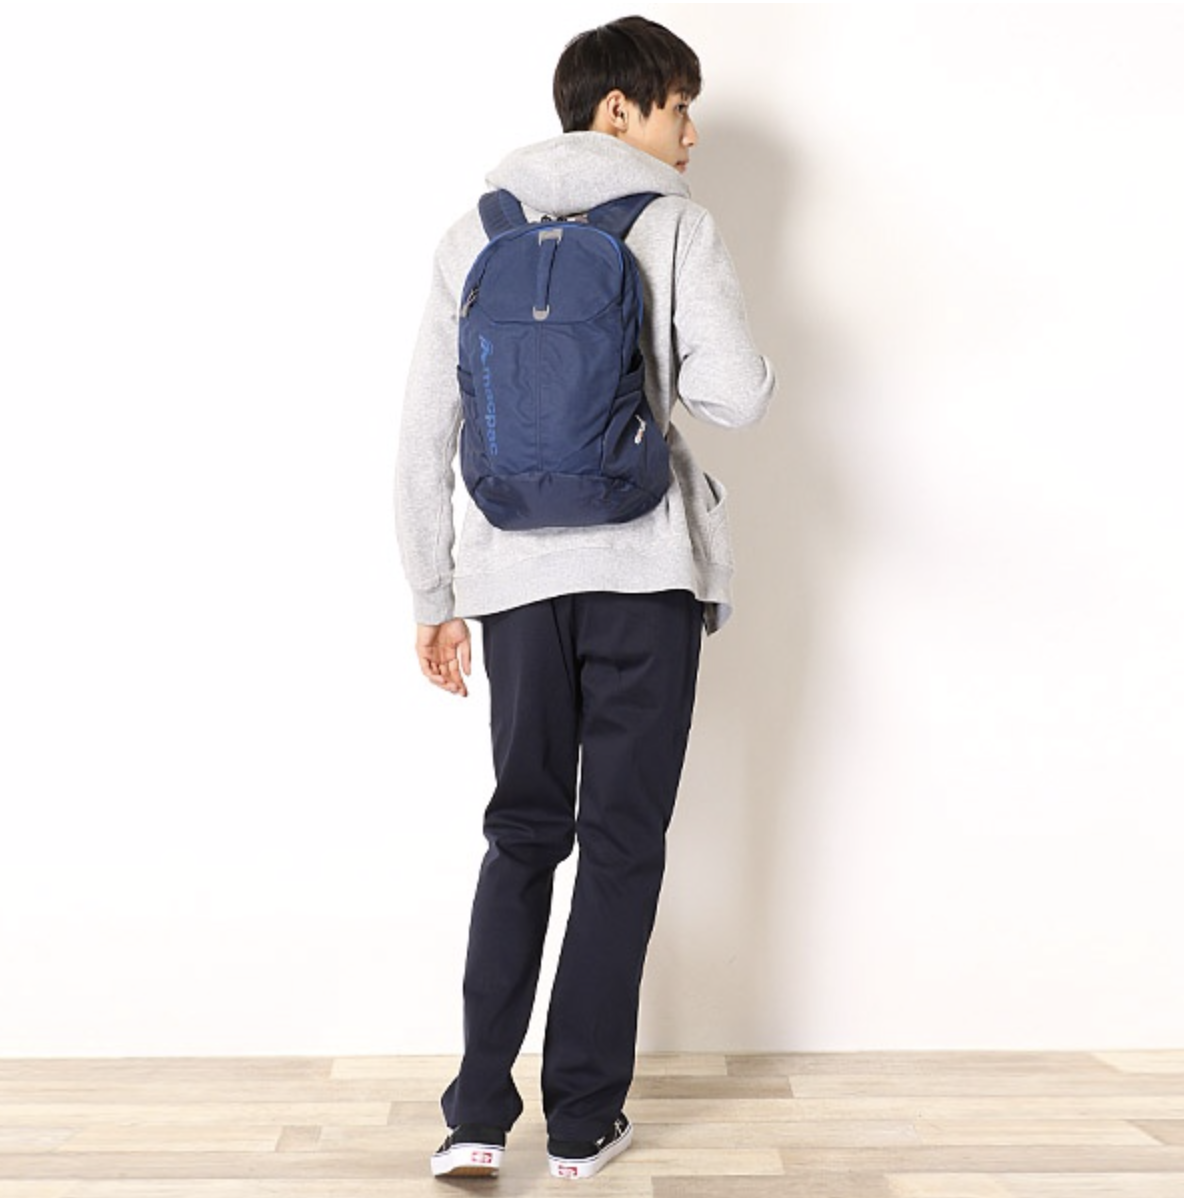 f:id:thebackpack:20191007181913p:plain